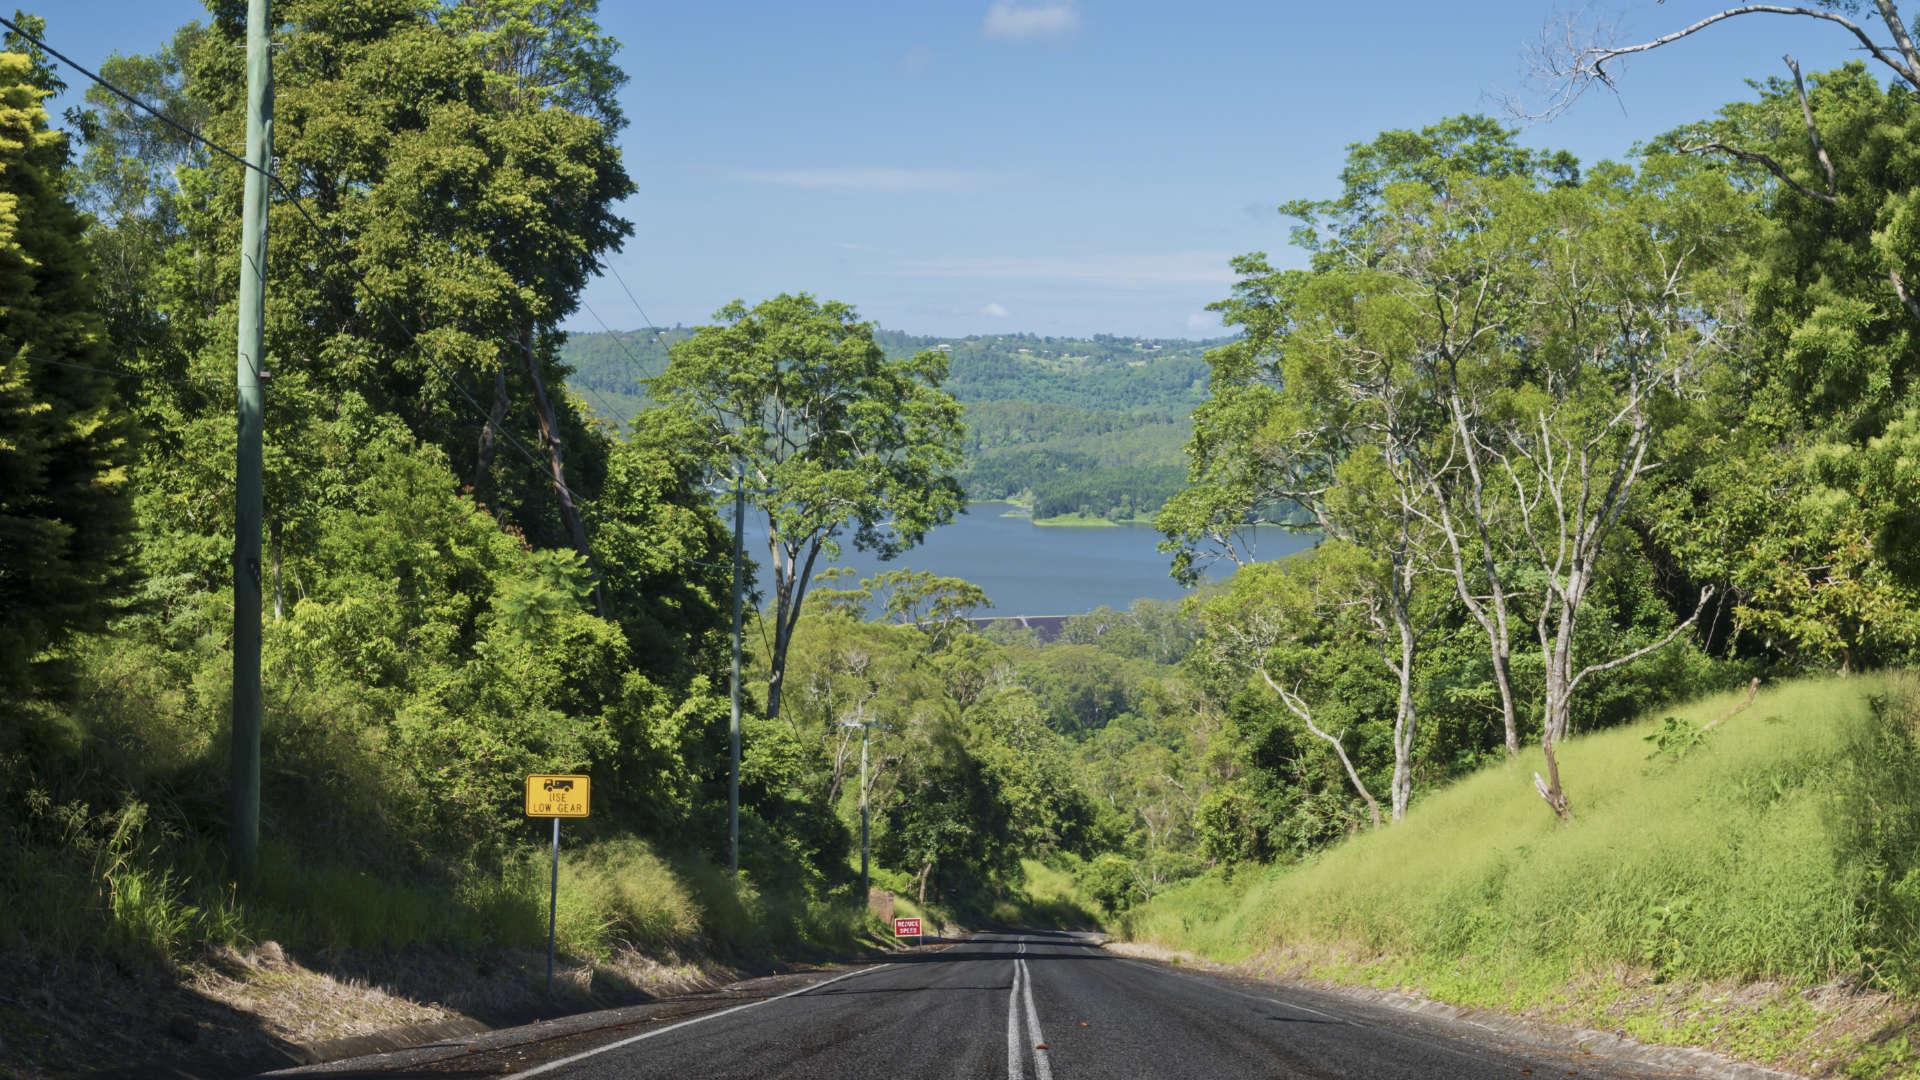 Obi Obi Road